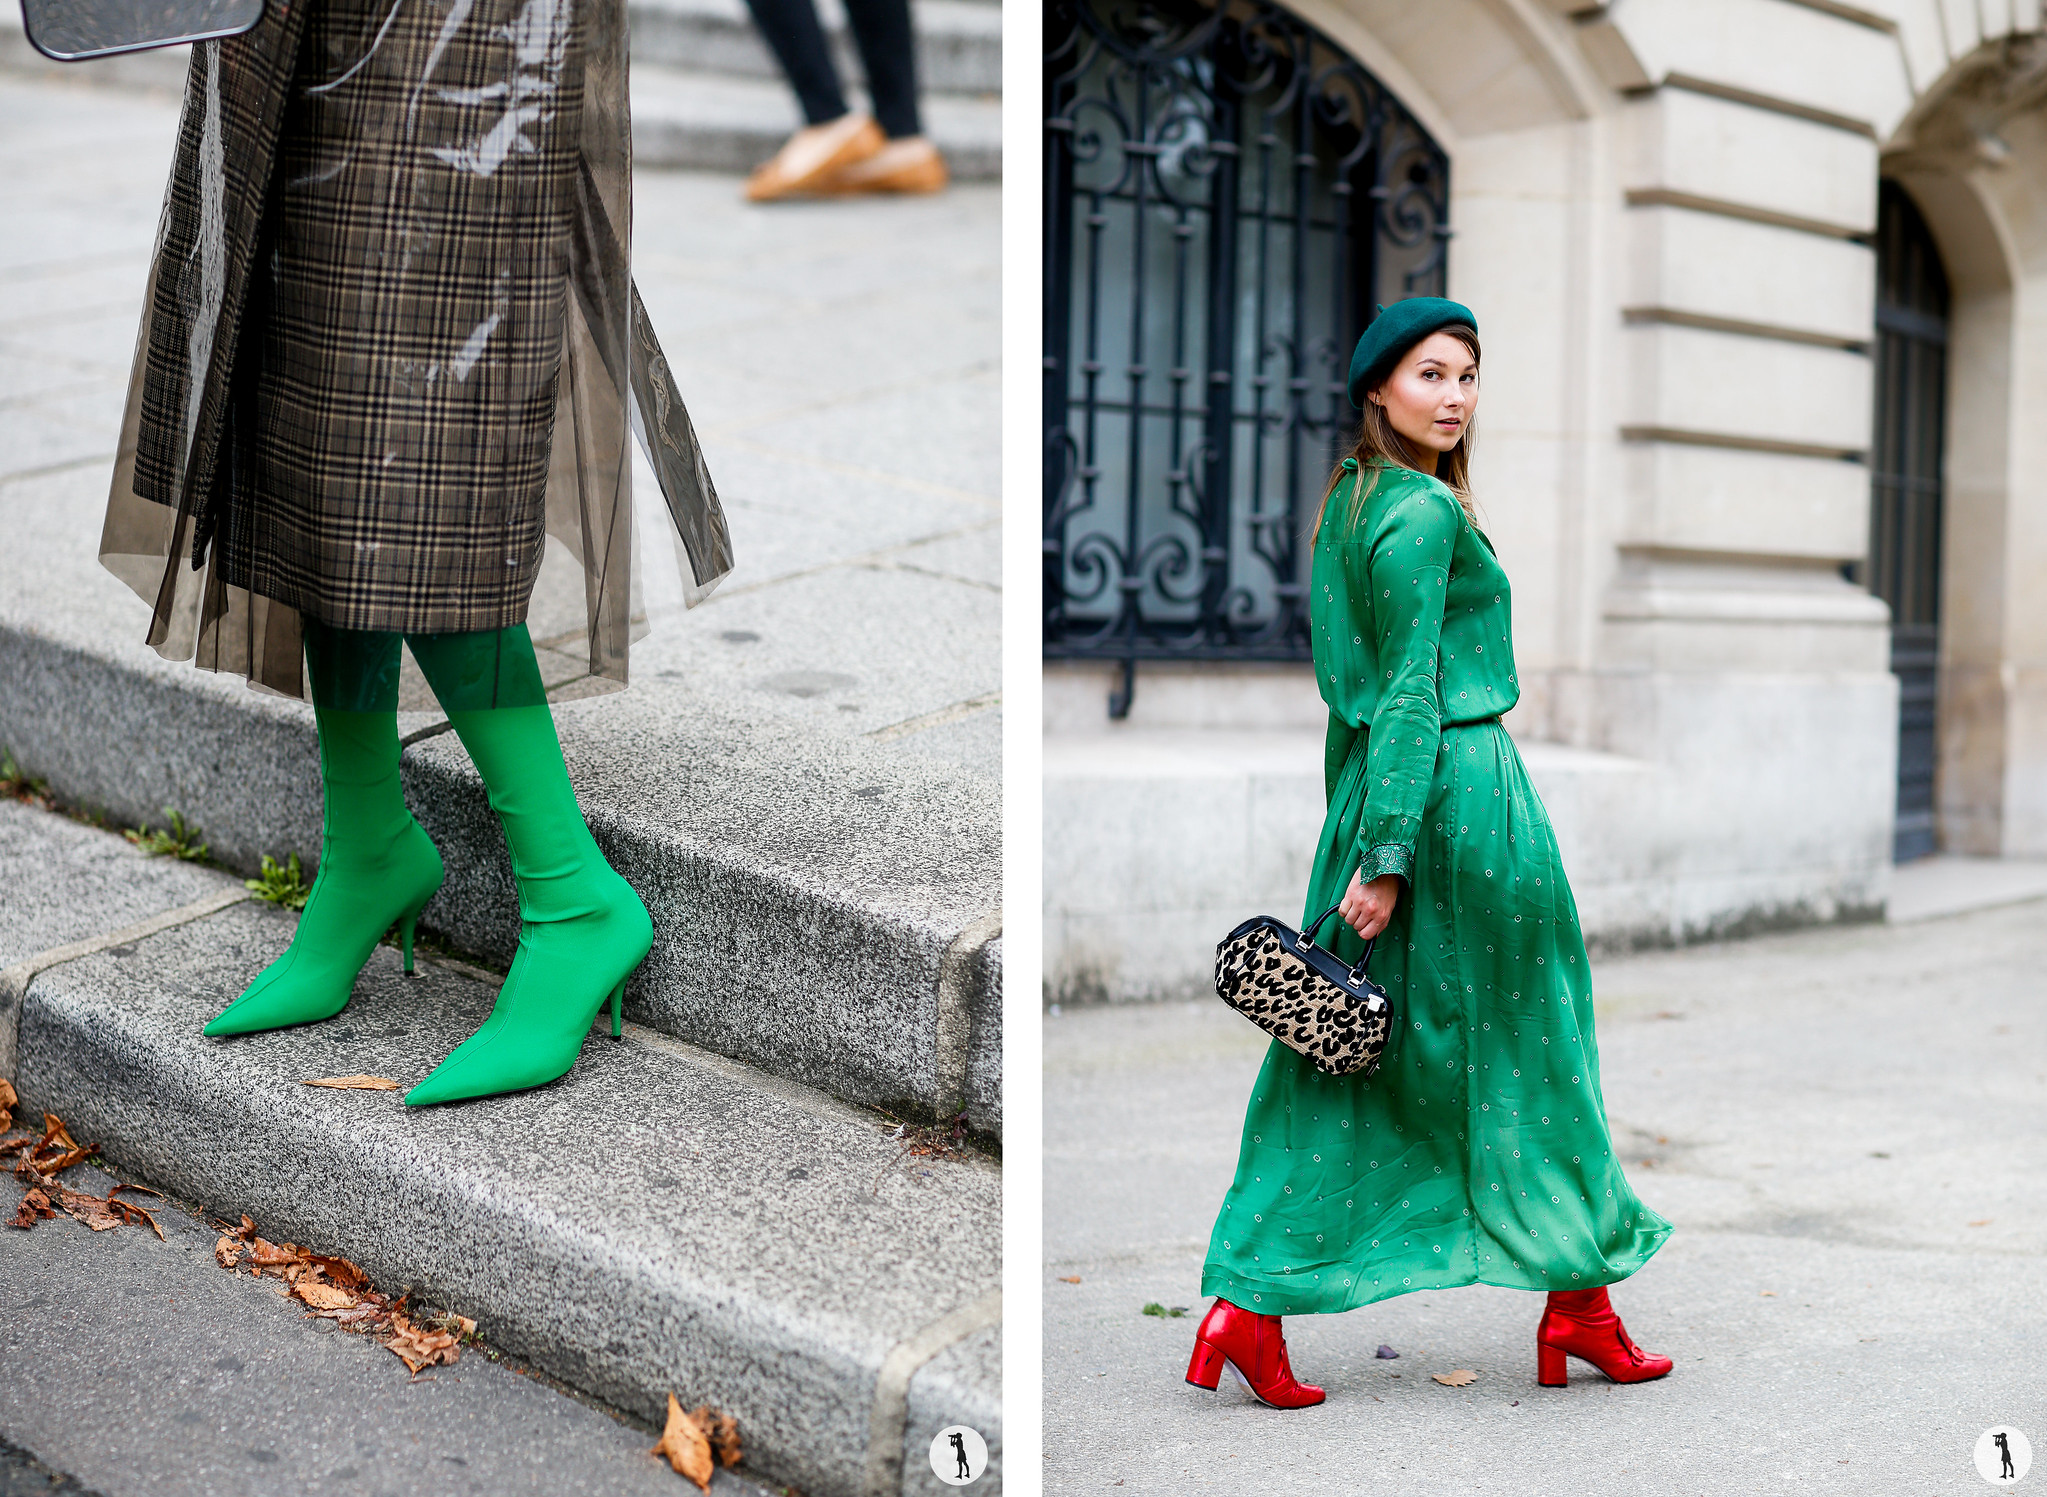 Close up and Angelica Ardasheva - Paris Fashion Week SS18